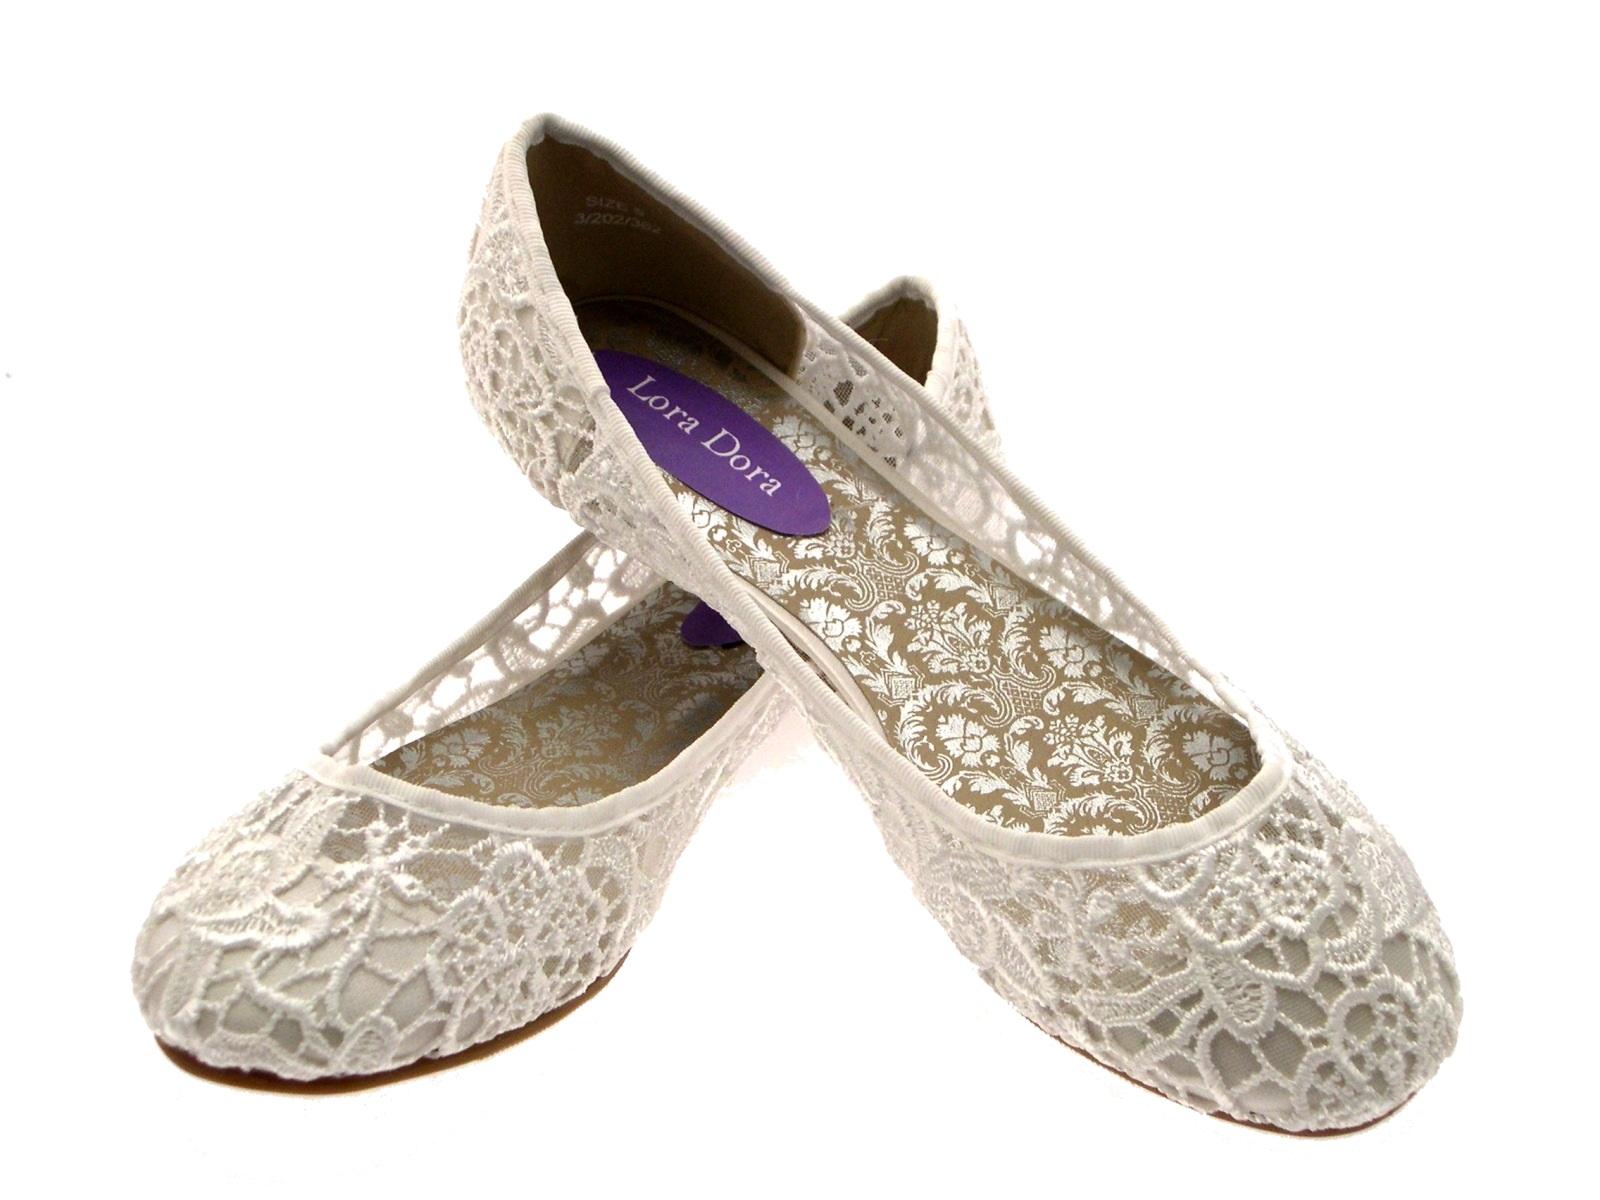 Womens Ivory Lace Ballet Pumps Flat Bridal Bridesmaid Shoes Ladies Size UK 3